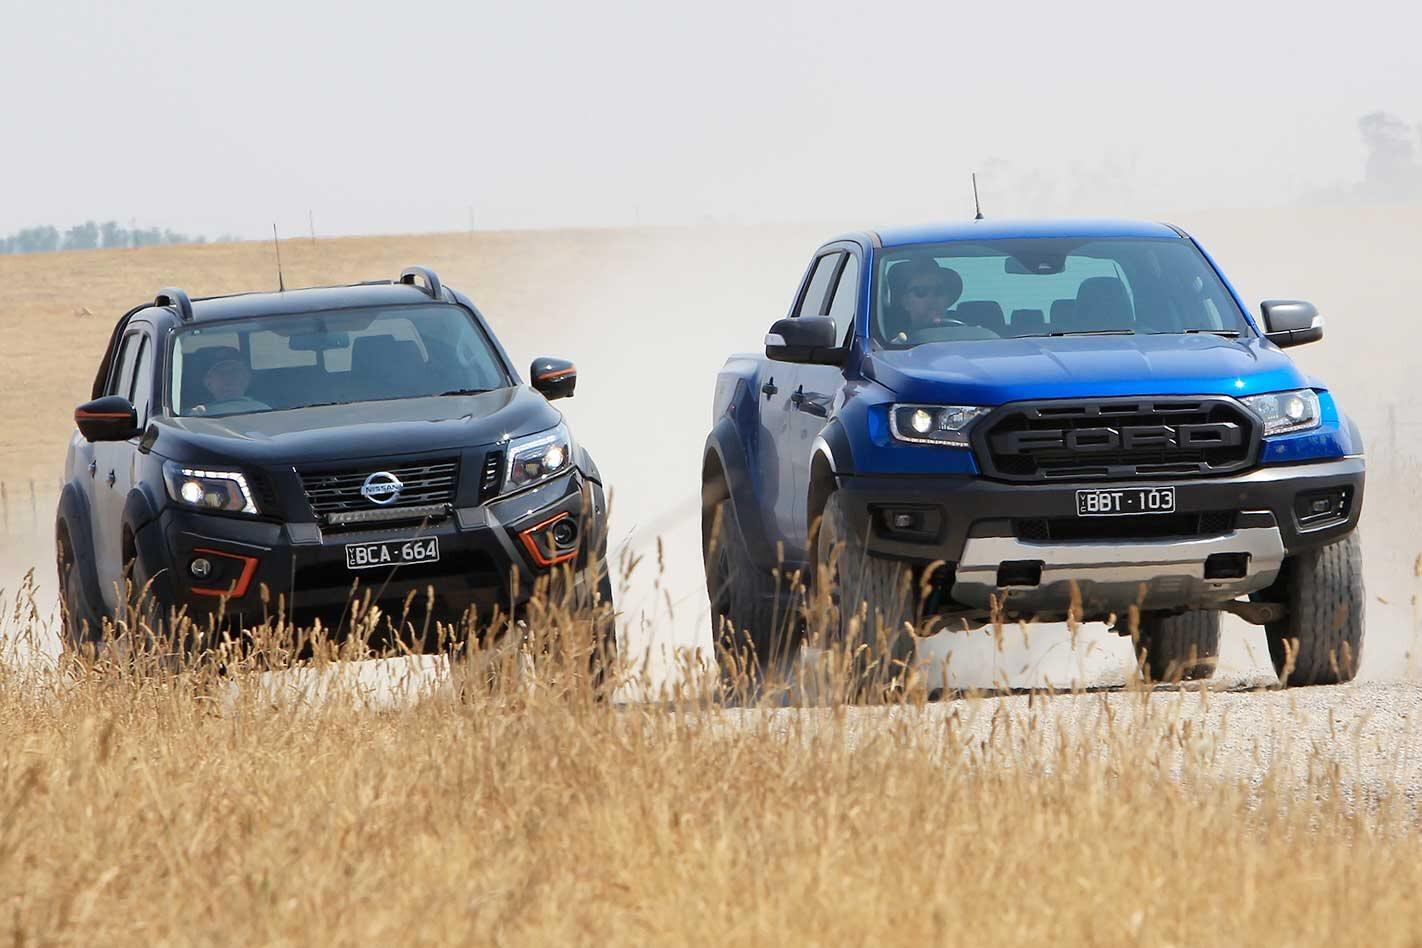 Ford Ranger Raptor vs Nissan Navara N-TREK Warrior comparison